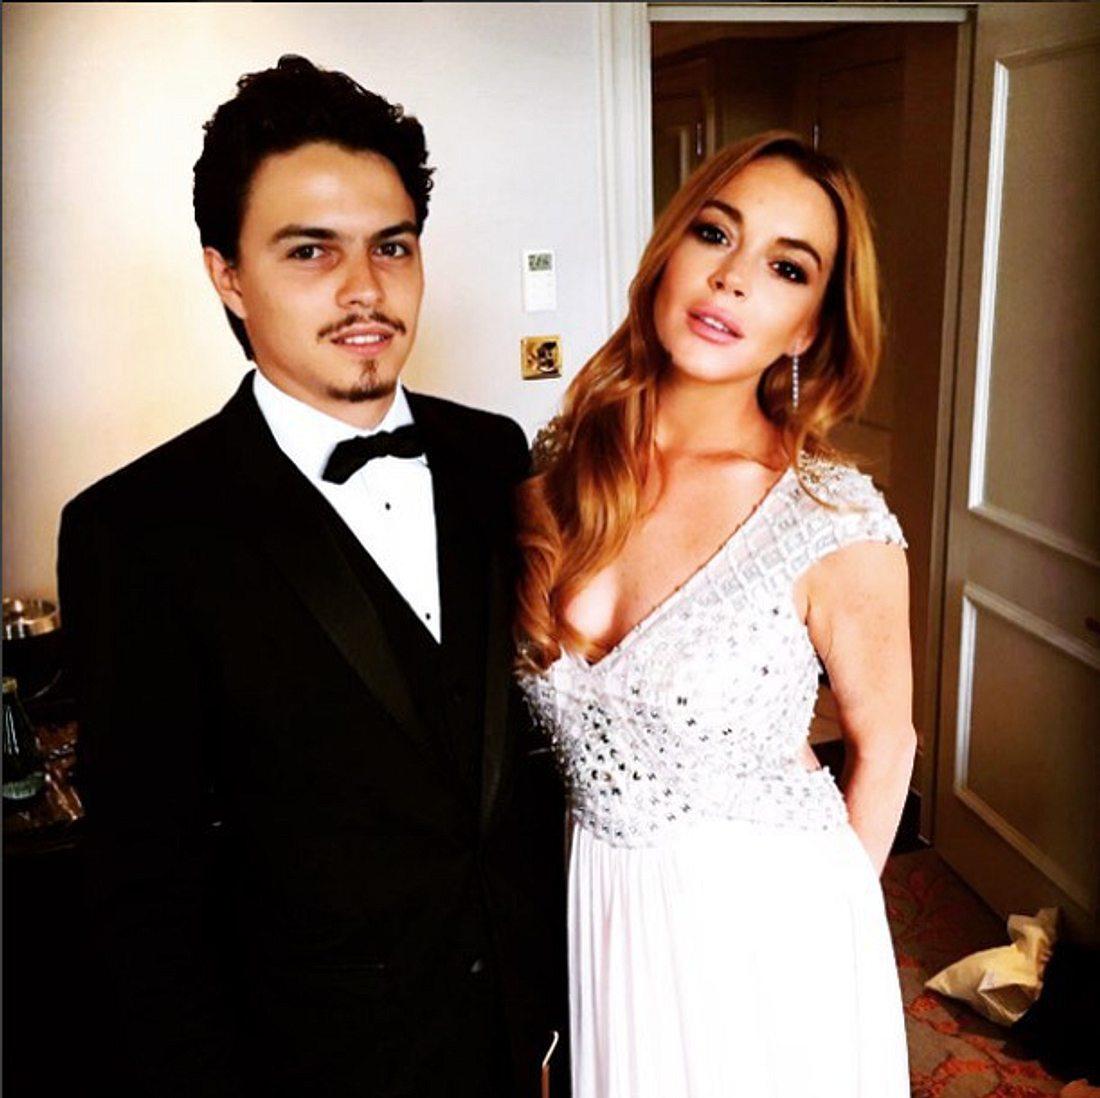 Lindsay Lohan ist nicht länger mit Egor Tarabasov verlobt